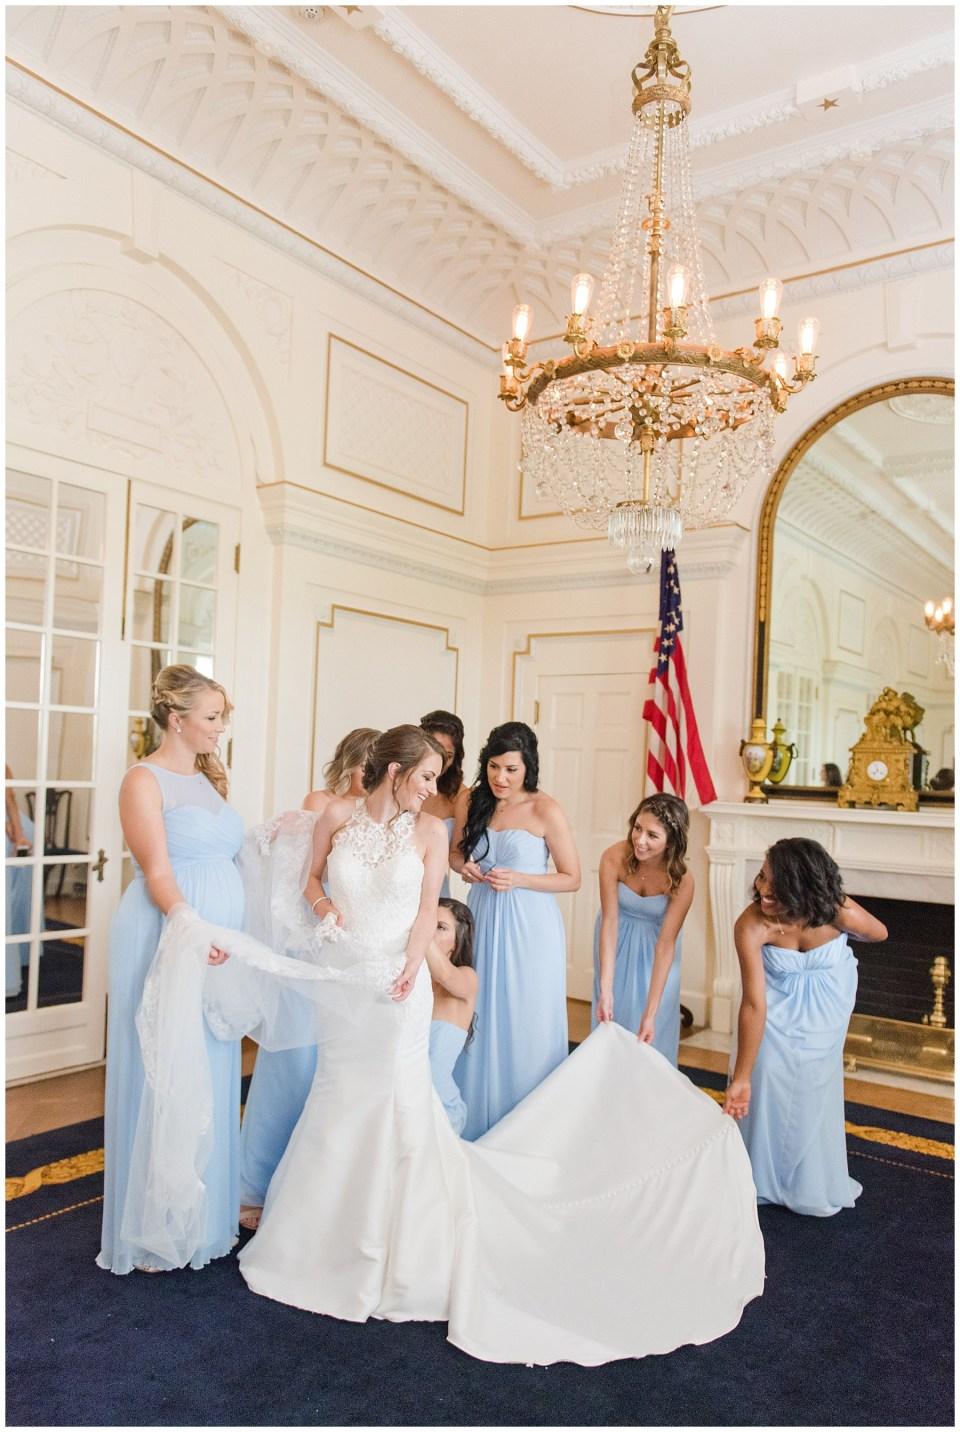 daughters-of-the-american-revolution-dar-dc-wedding-photos-dc-wedding-photographer-fall-wedding-photo-17_photos.jpg